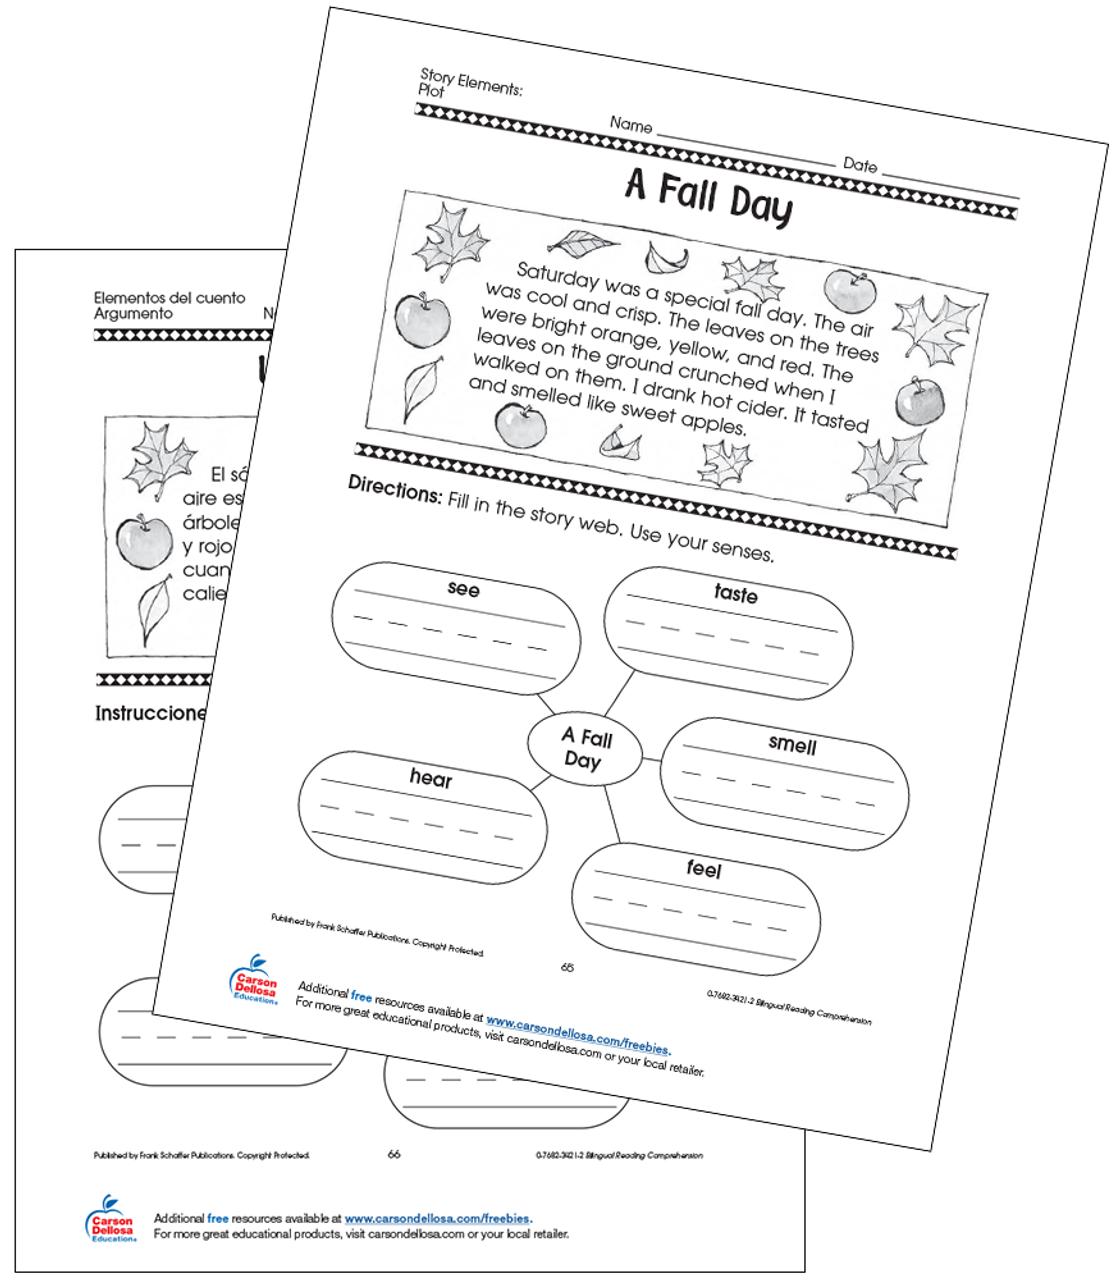 a fall day grade 1 bilingual free printable carson dellosa a fall day grade 1 bilingual free